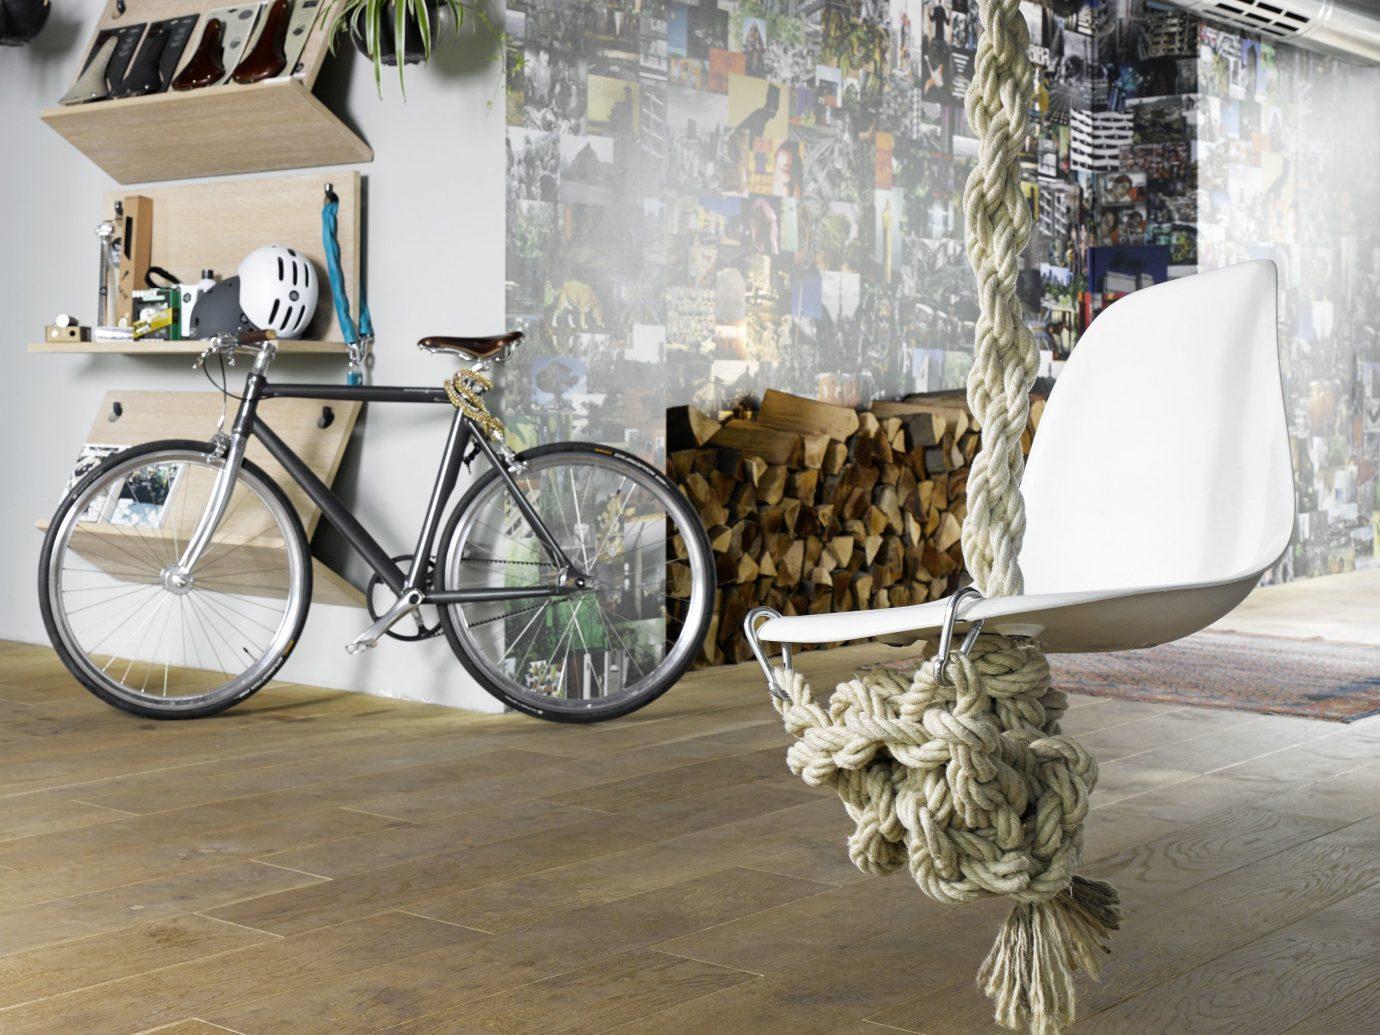 Budget bicycle vehicle land vehicle wheel art sports equipment